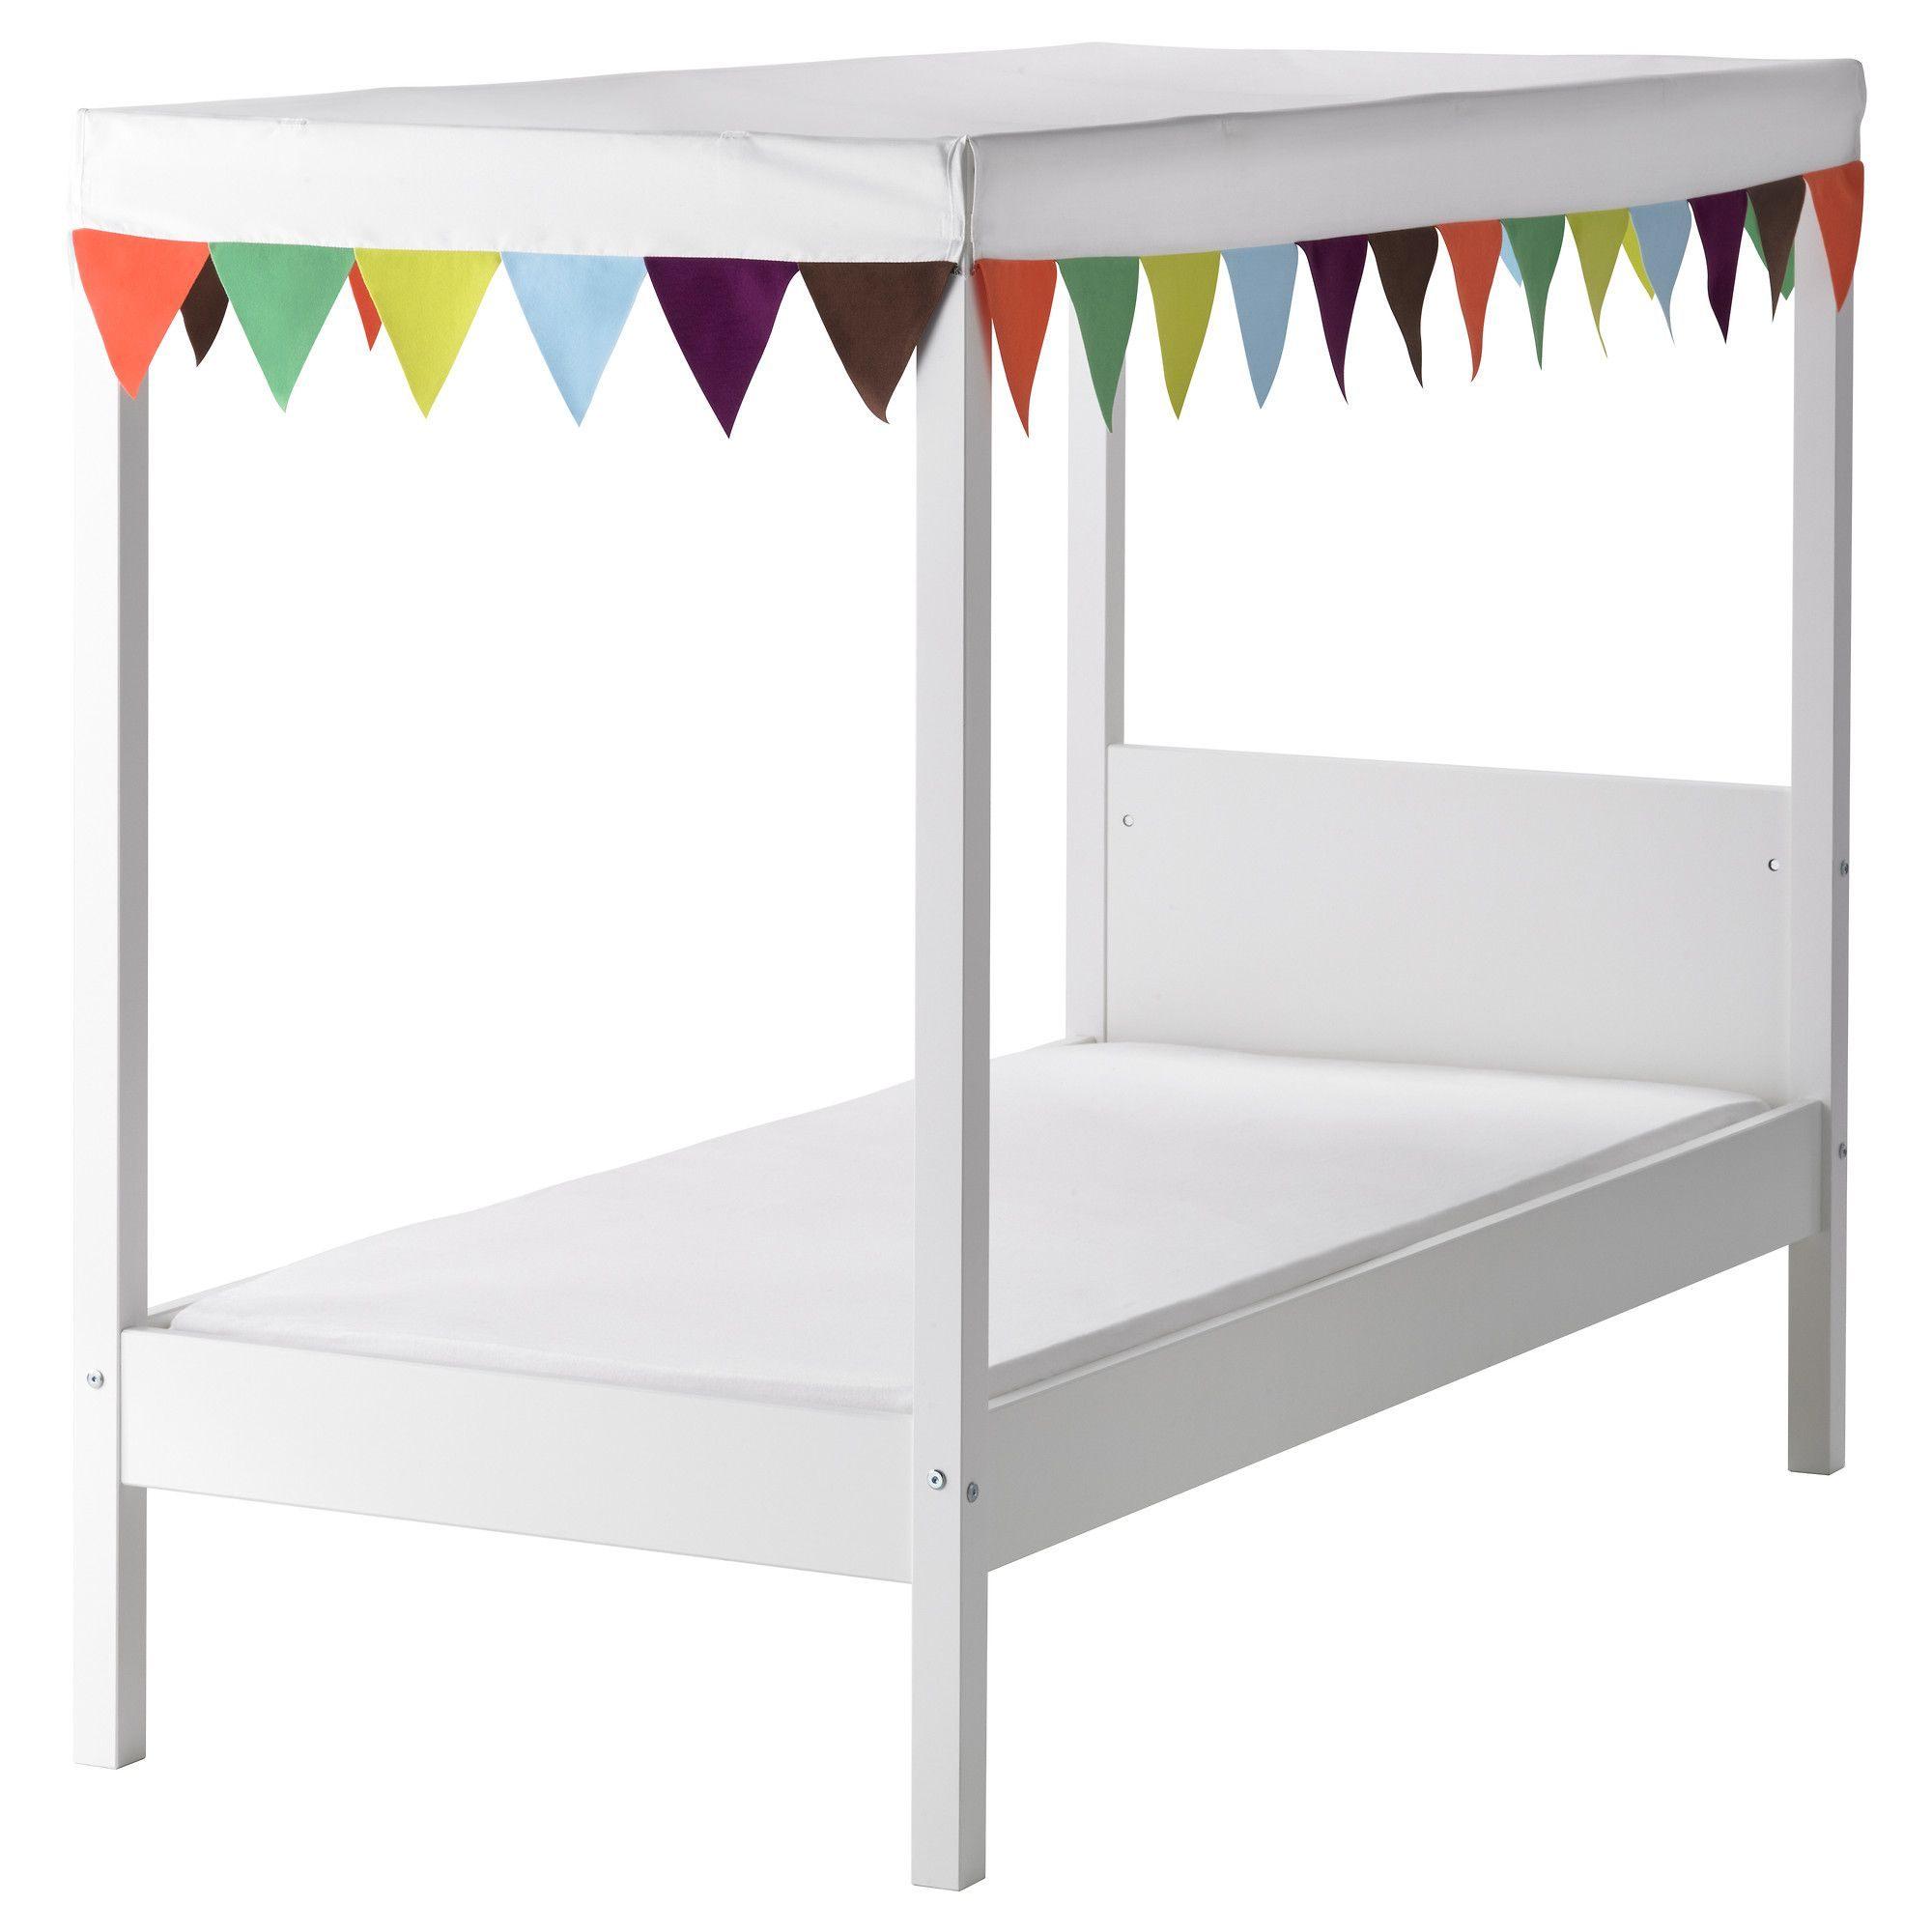 Ikea Lit Cabane Le Luxe –vre Bedframe M Lattenbodem Bedhemel Ikea